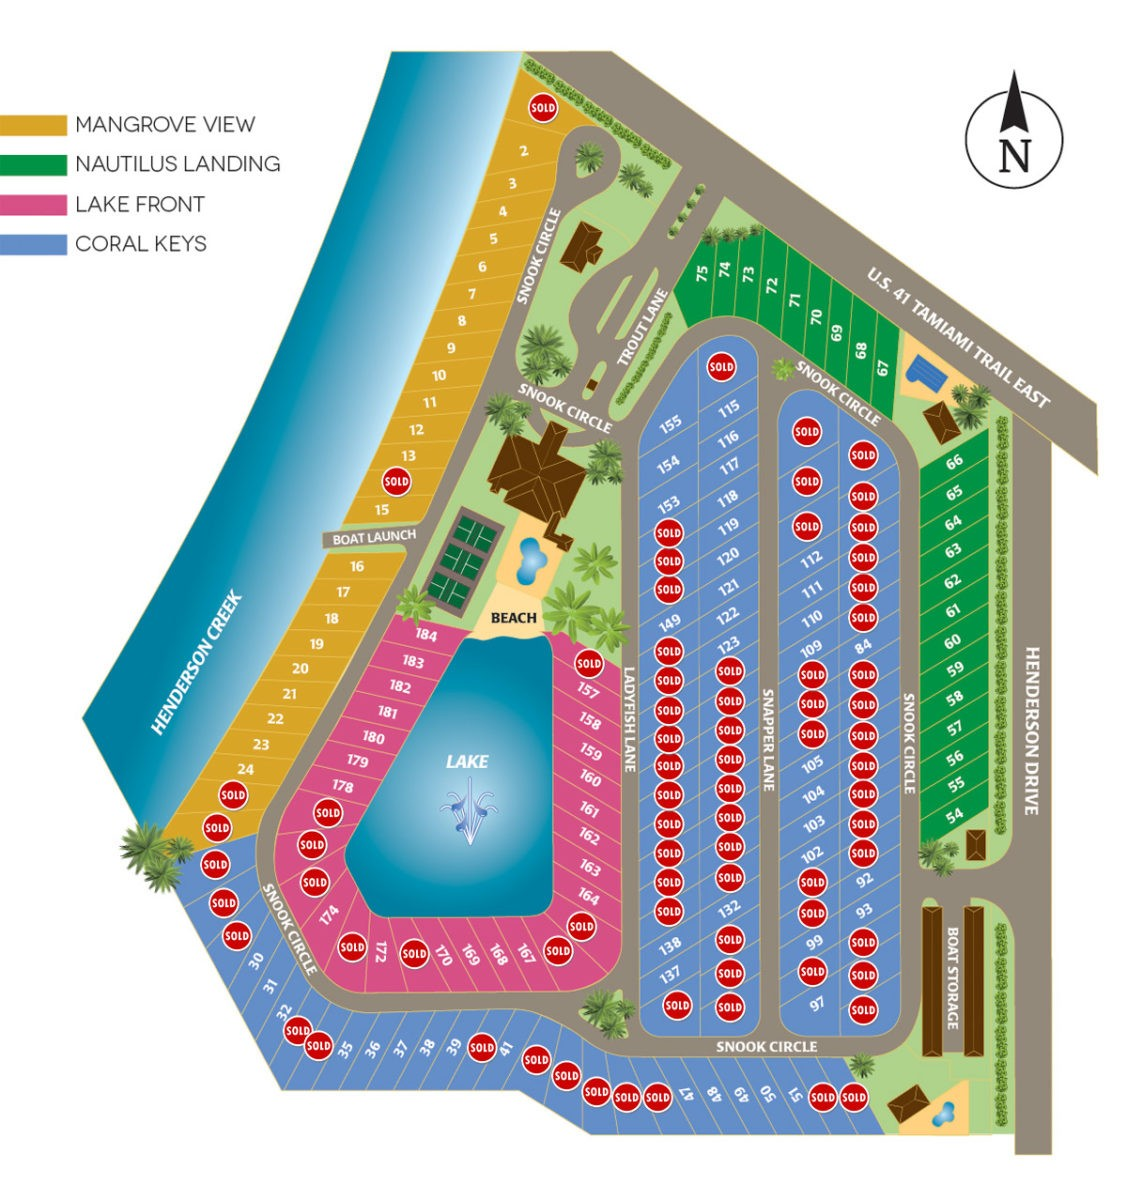 Naples Motorcoach Resort Site Map